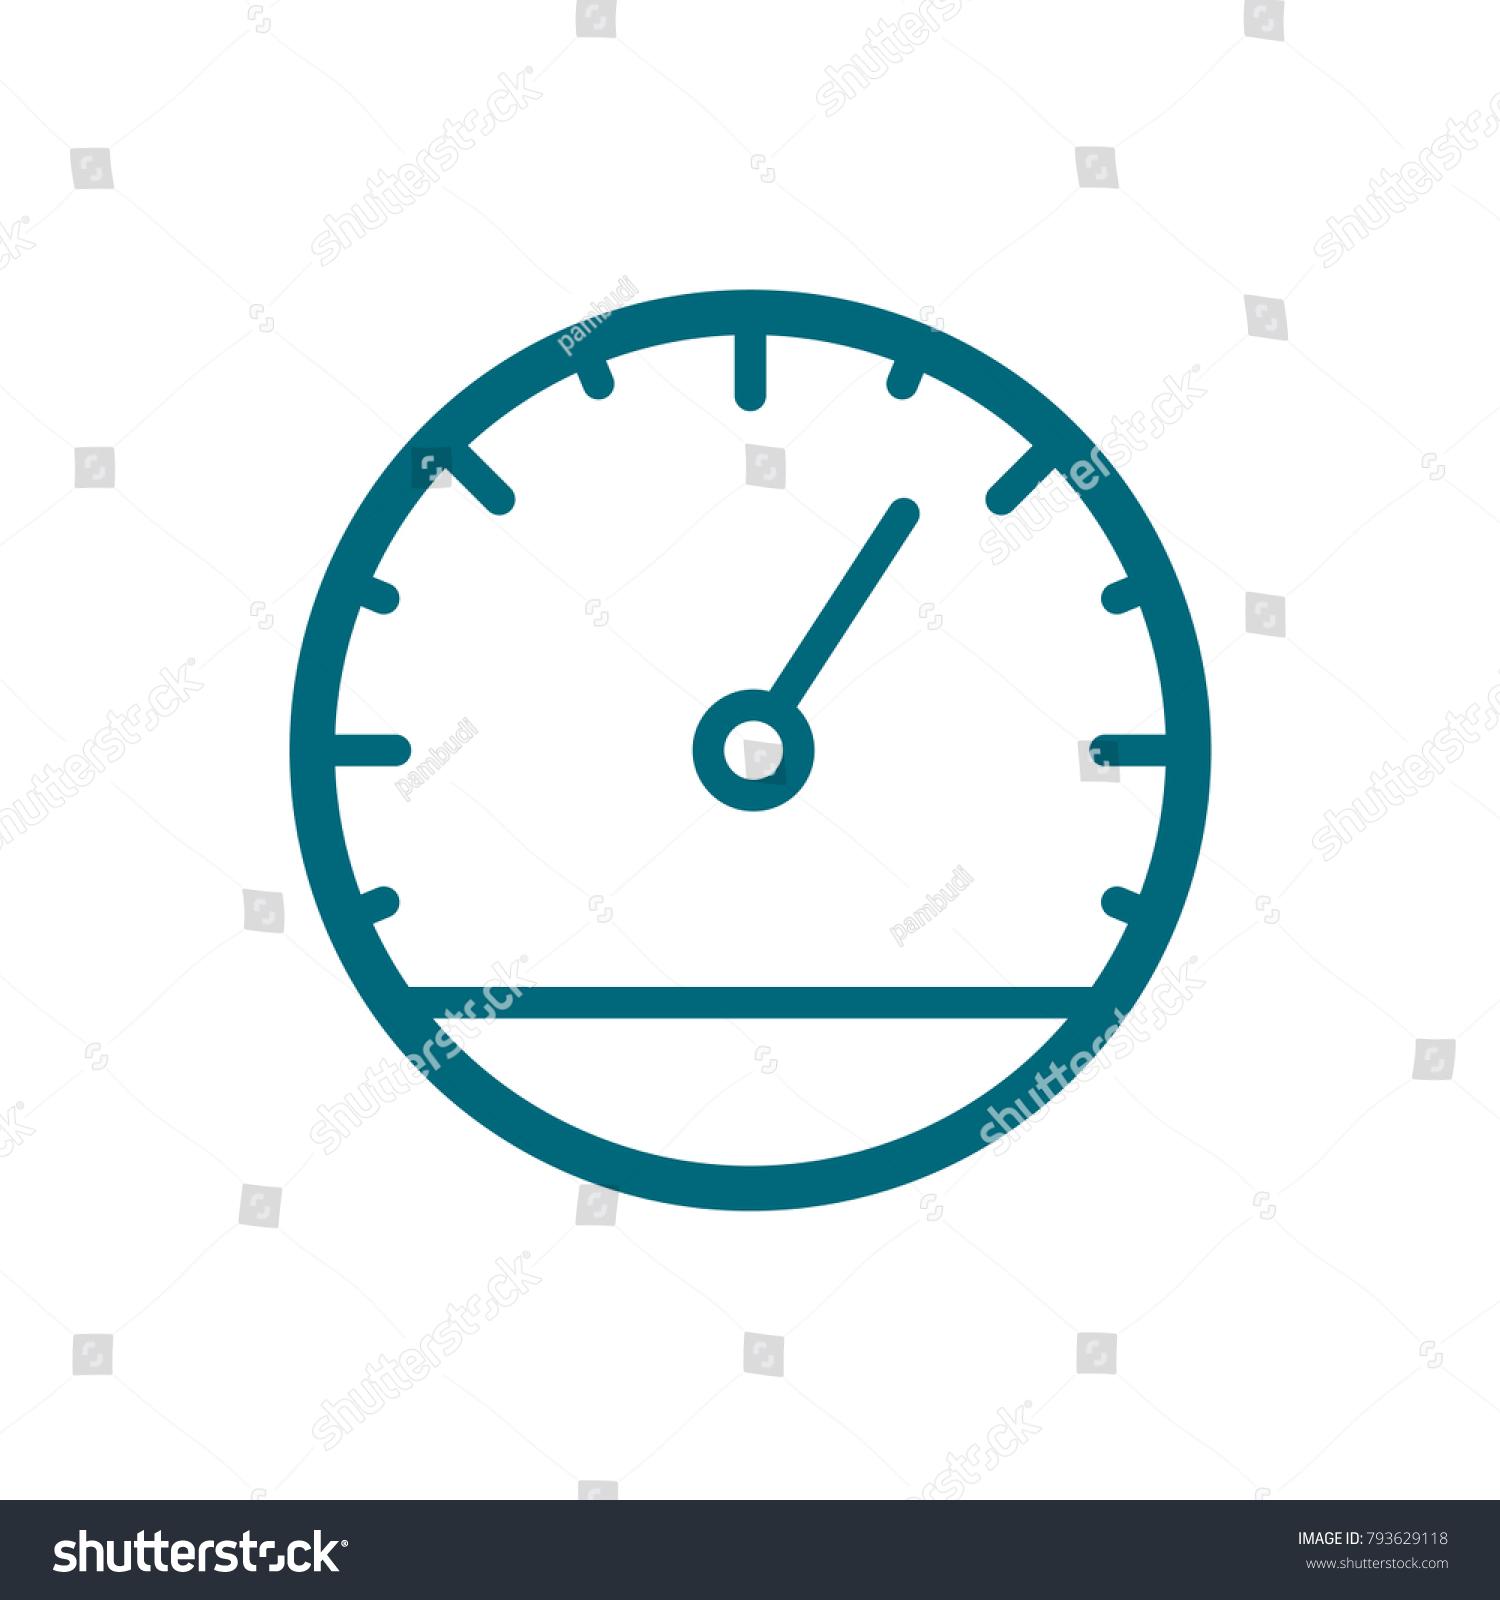 speedometer vector icon speedometer icon trendy stock photo photo rh shutterstock com vector speedometer mobil speedometer vector free